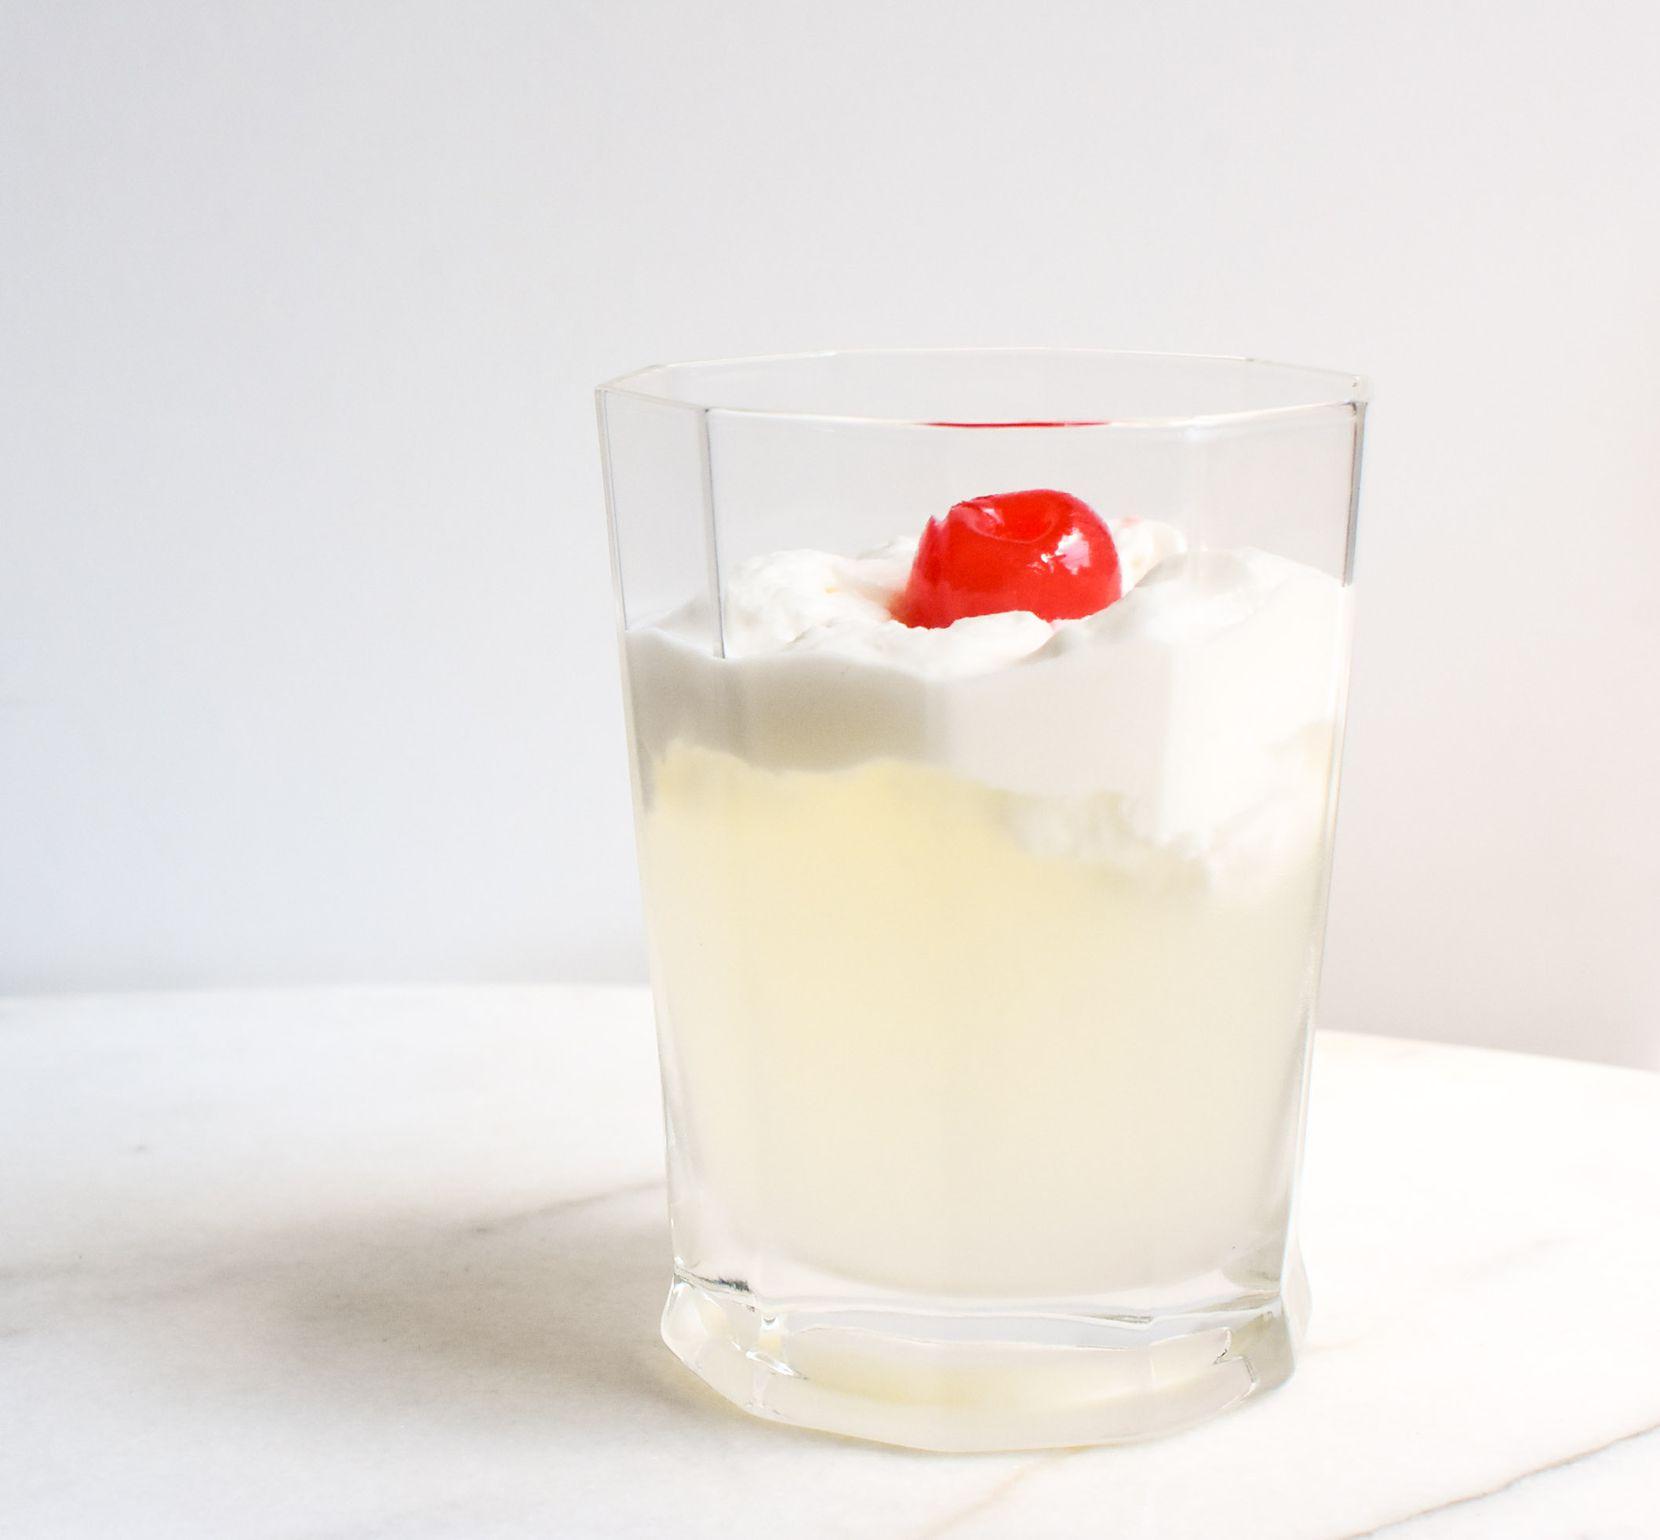 Lemonade with Pineapple Whipped Cream